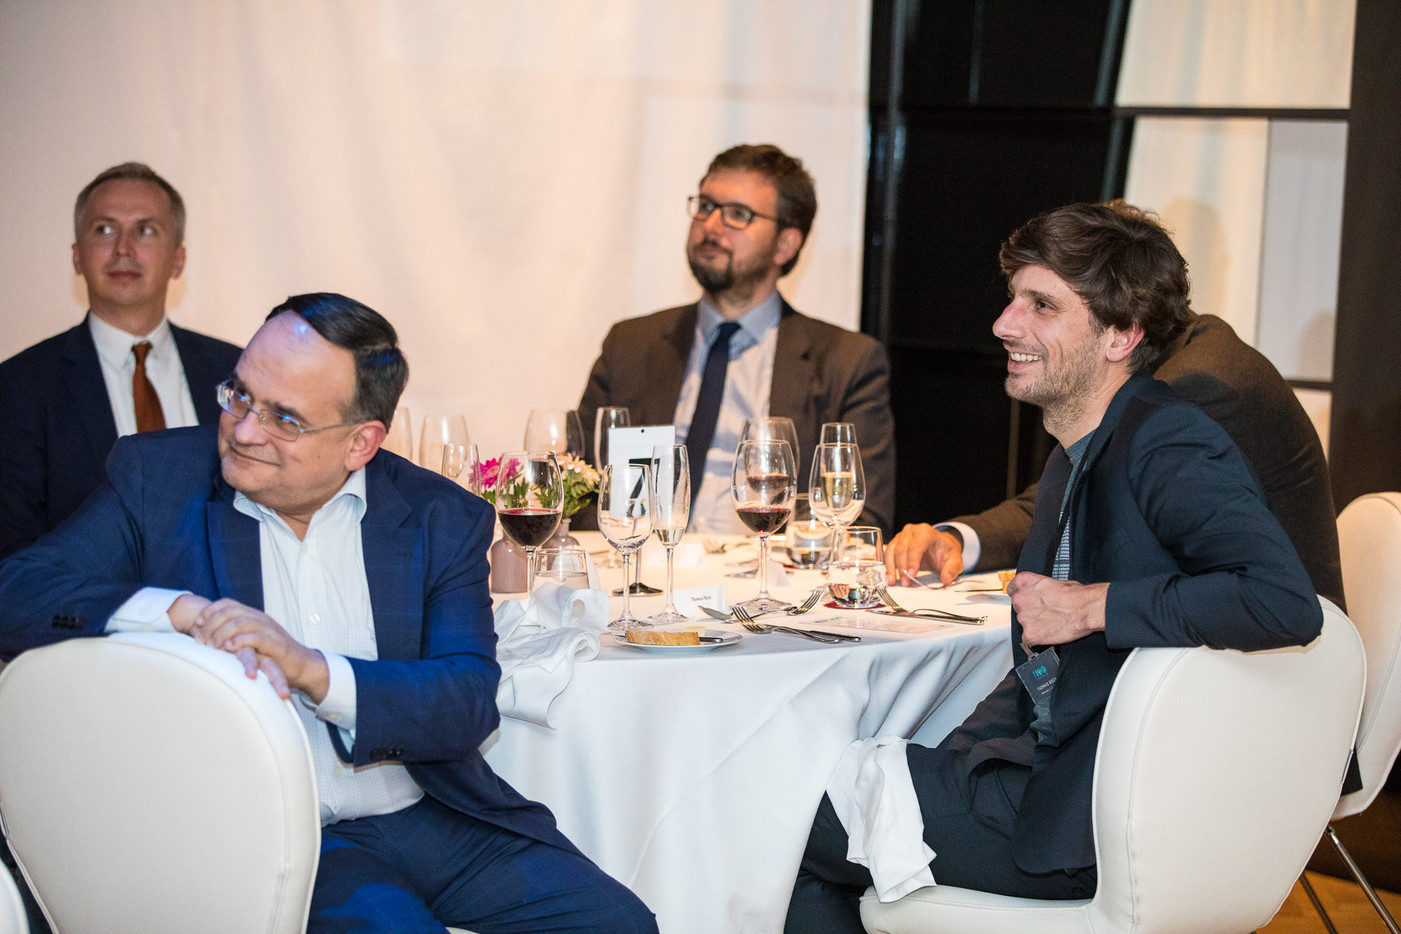 Carlos Alvarez Pereira, Jakub Klepal, Th